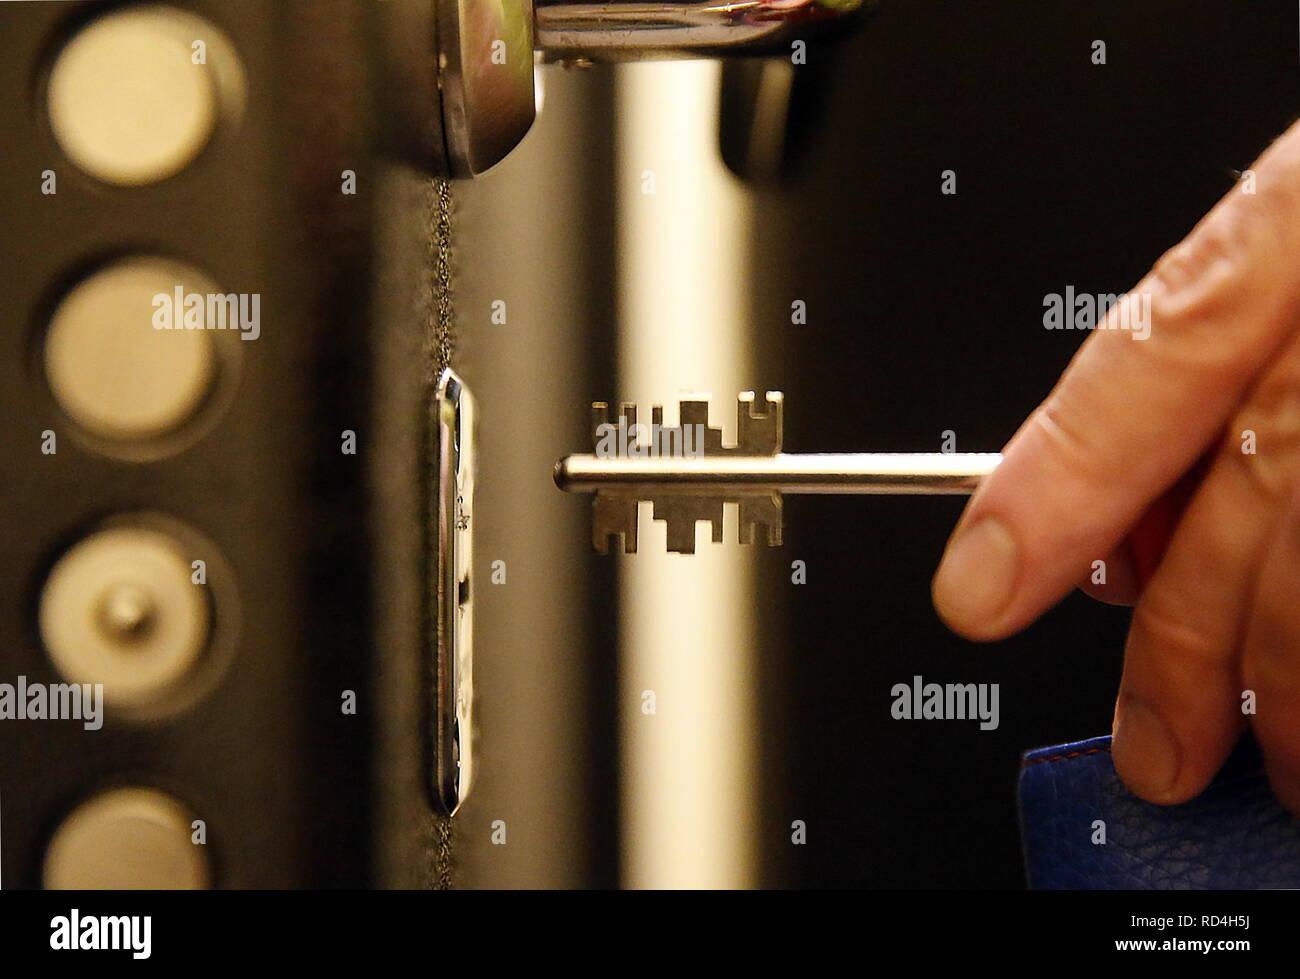 ROSTOV-ON-DON, RUSSIA - JANUARY 10, 2019: Inserting a key into a keyhole. Valery Matytsin/TASS - Stock Image